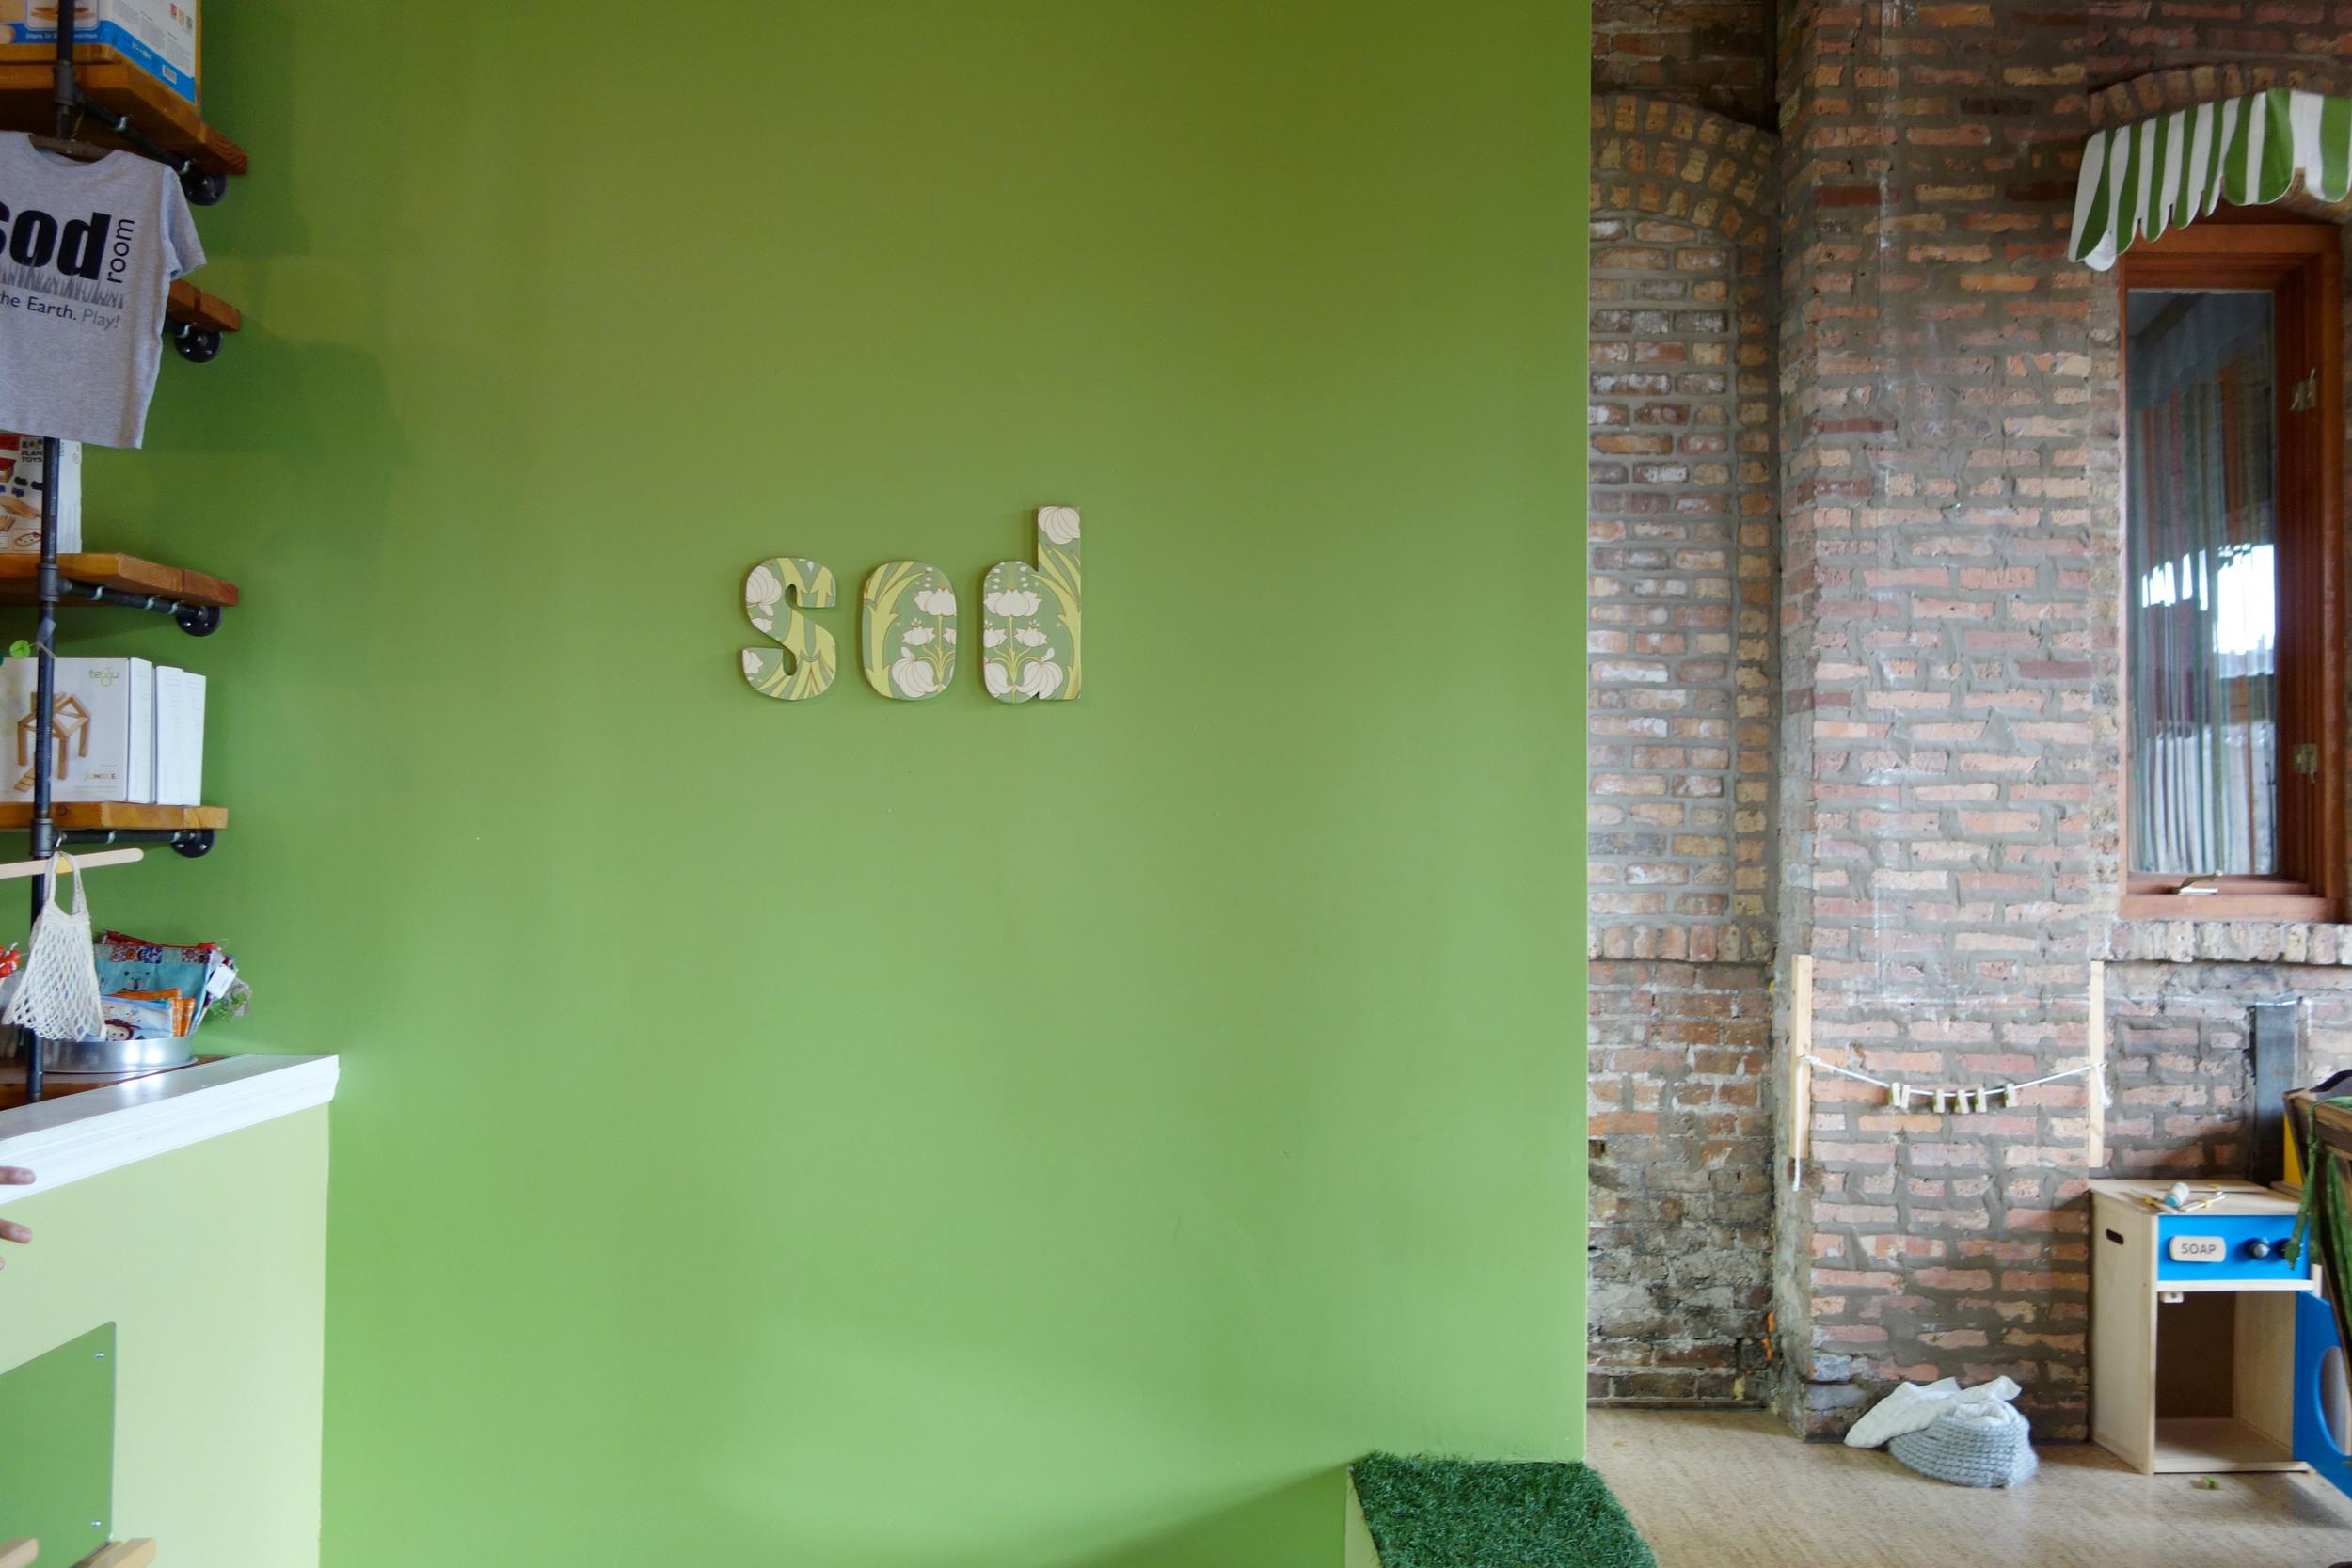 Sod Room